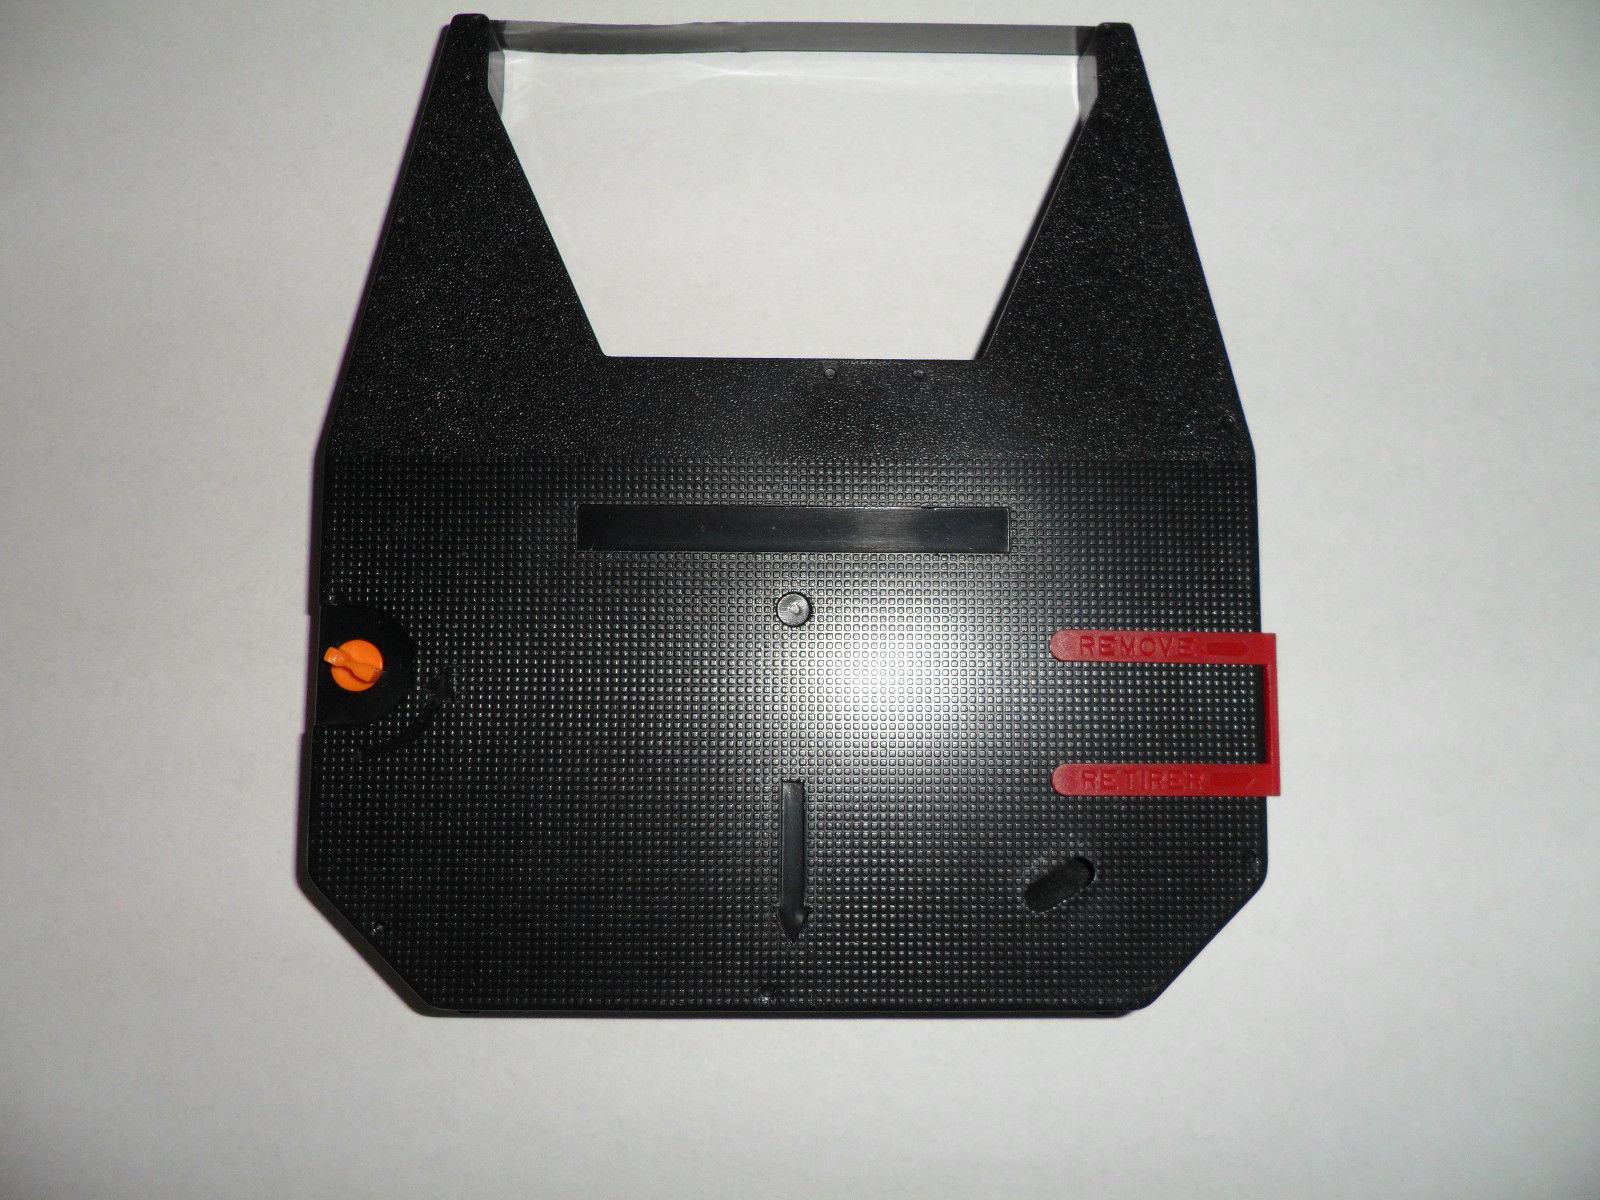 Brother Executron 50/Executron 60 Typewriter Ribbon Replaces 7020 B165 T330